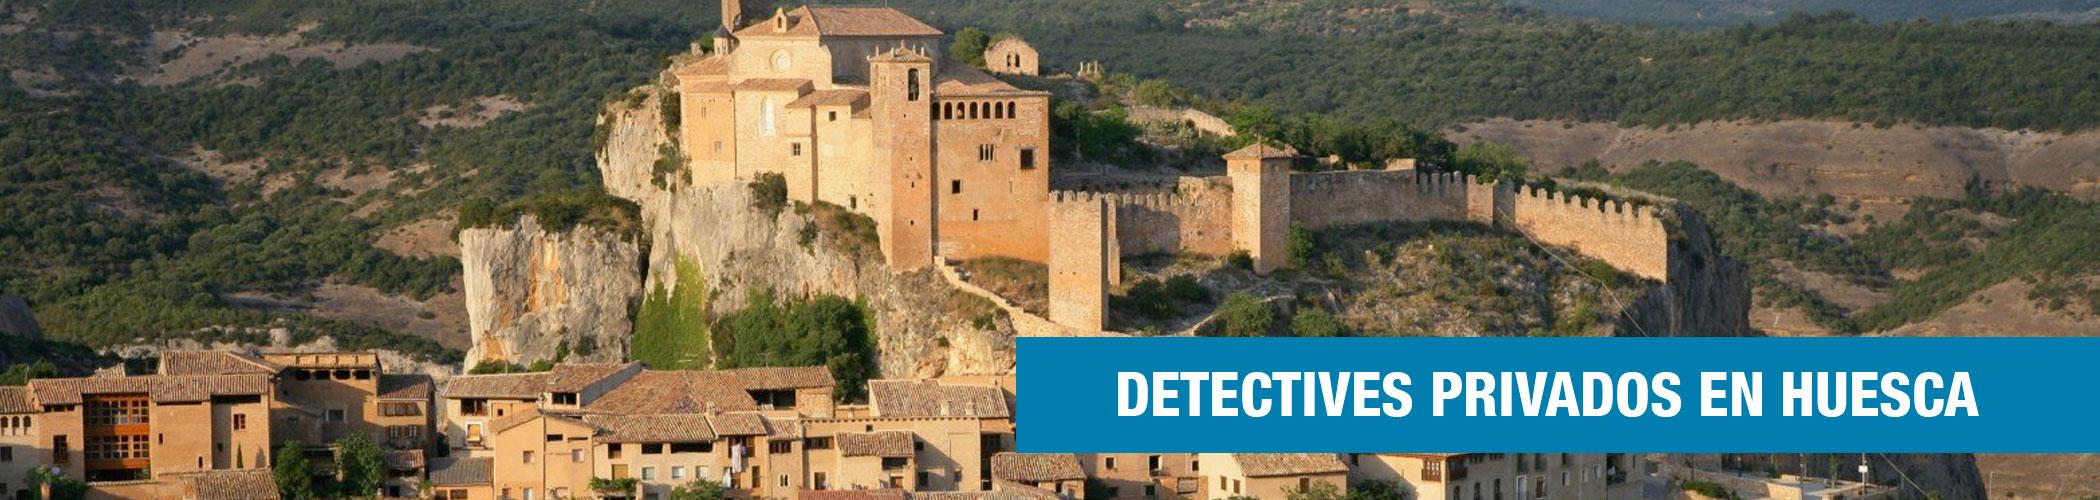 Detectives Privados Huesca